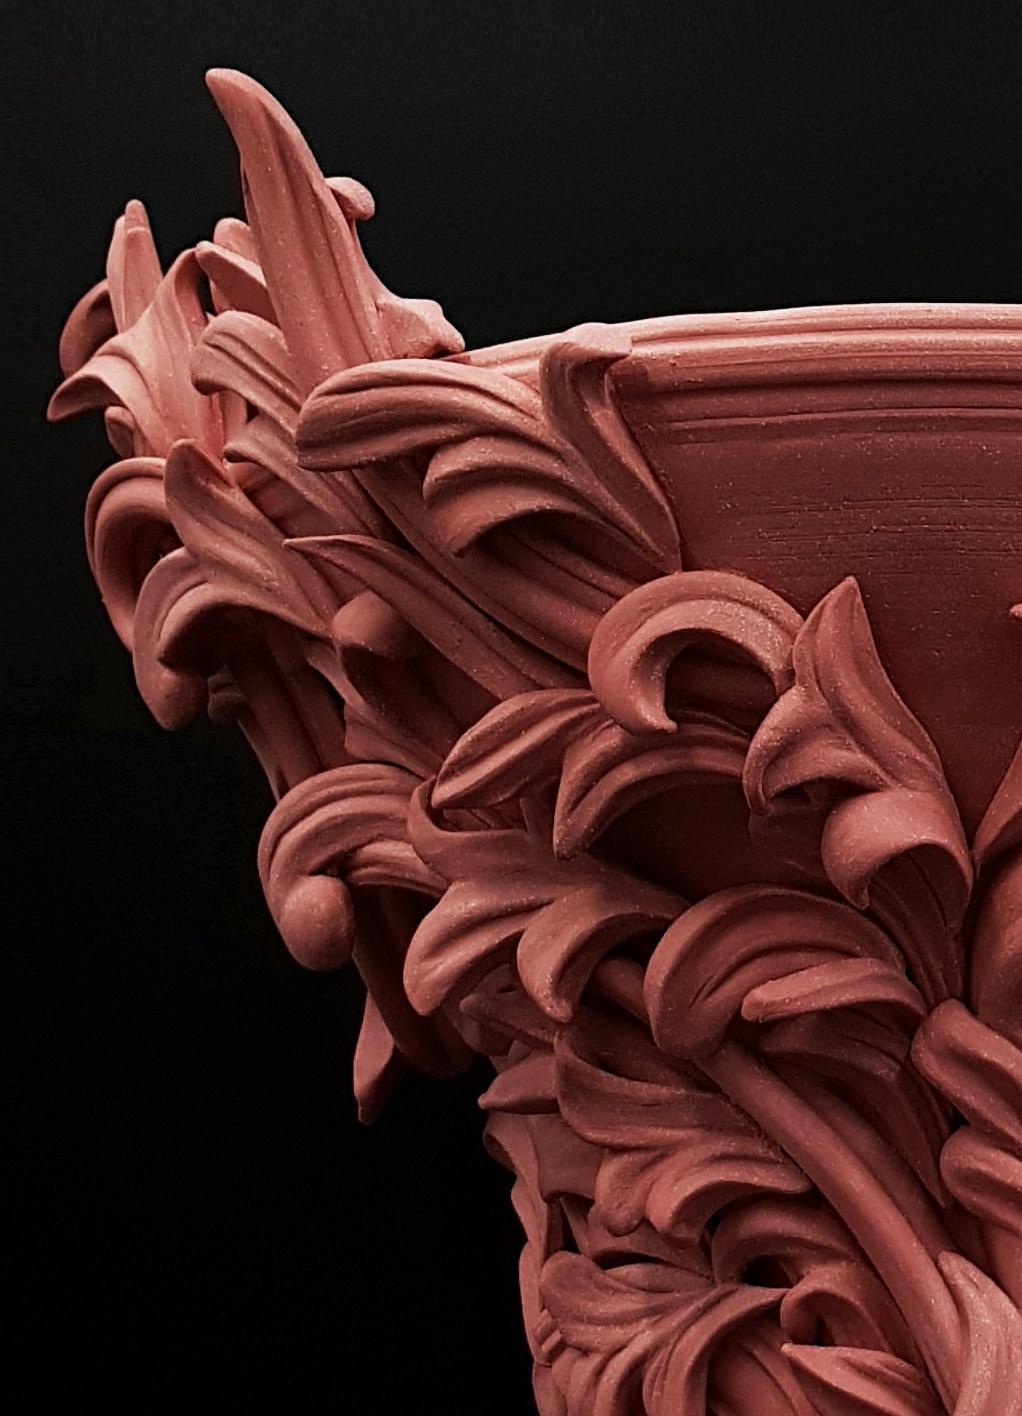 Vari Capitelli V clay vase art sculpture in pink detail